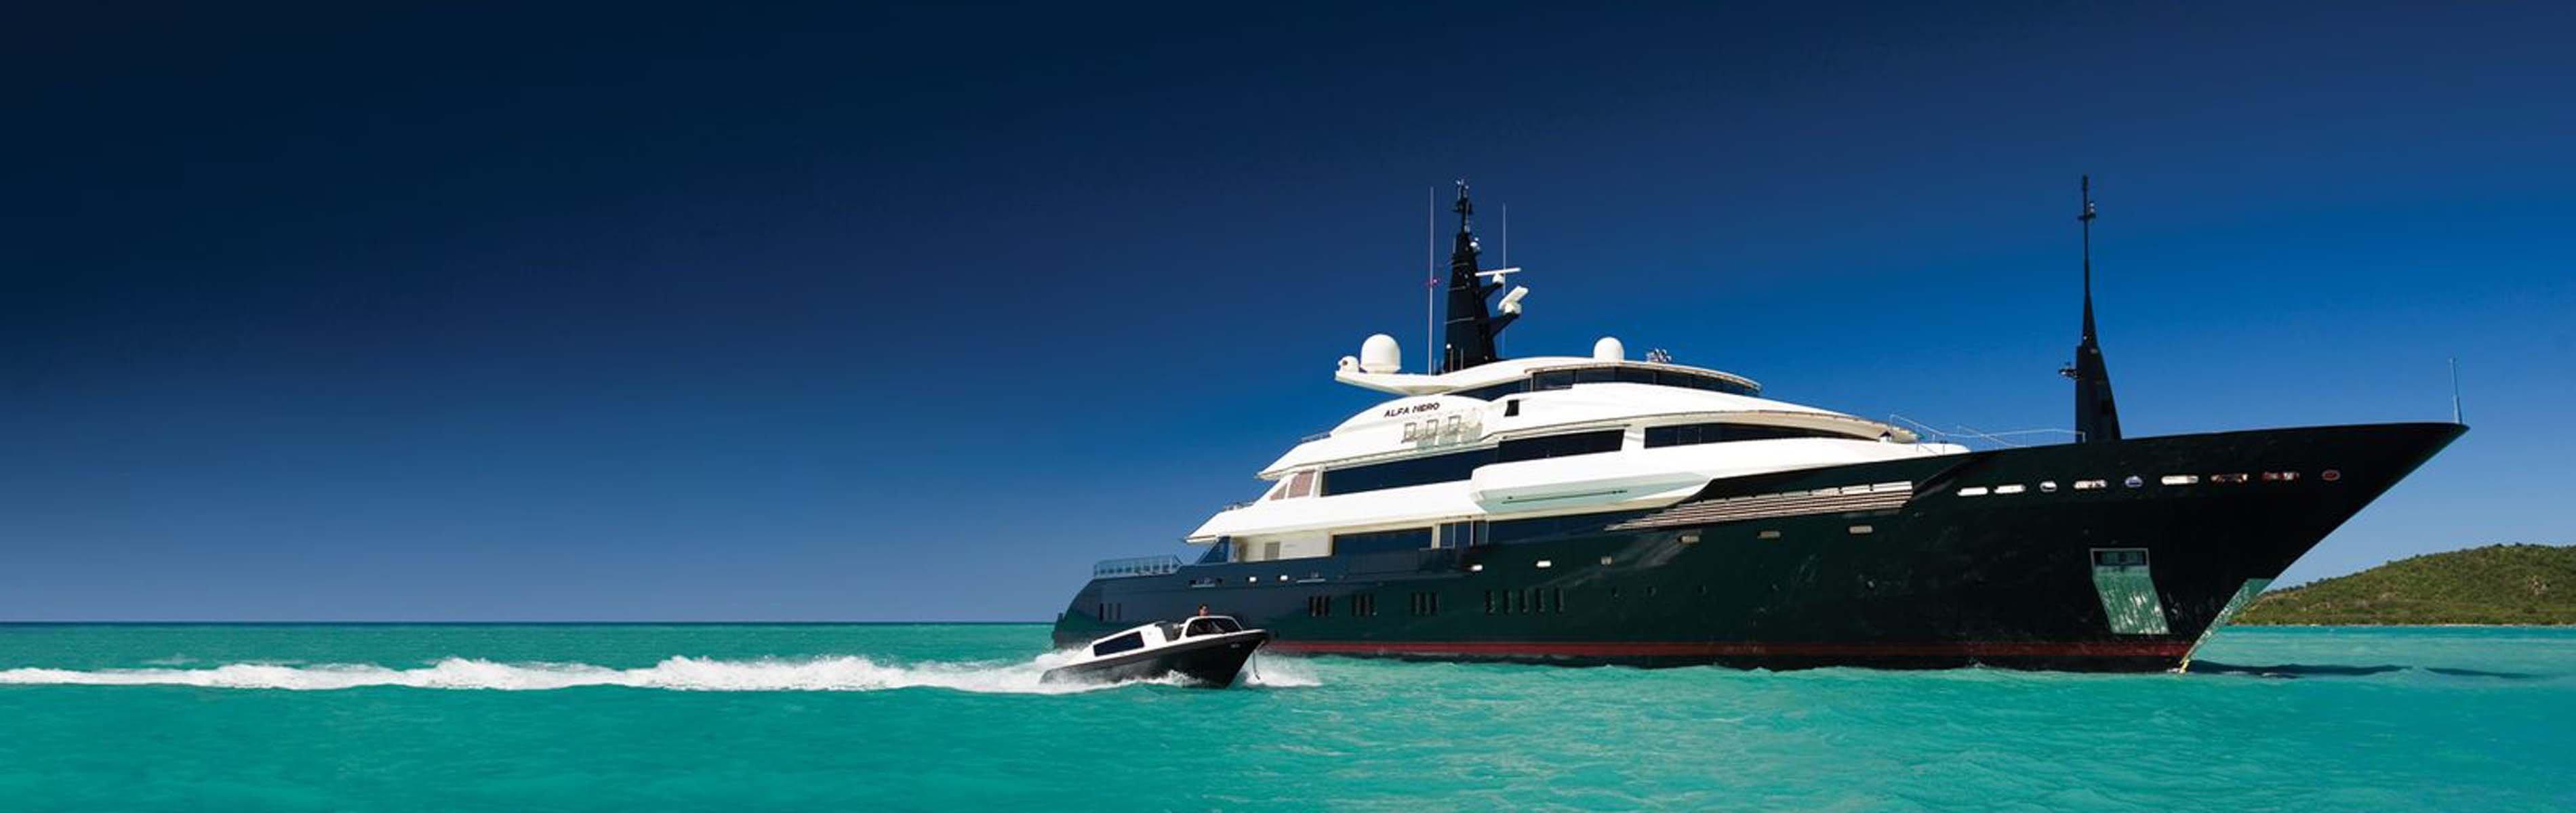 yacht ship boat 33 wallpaper 3800x1200 317729